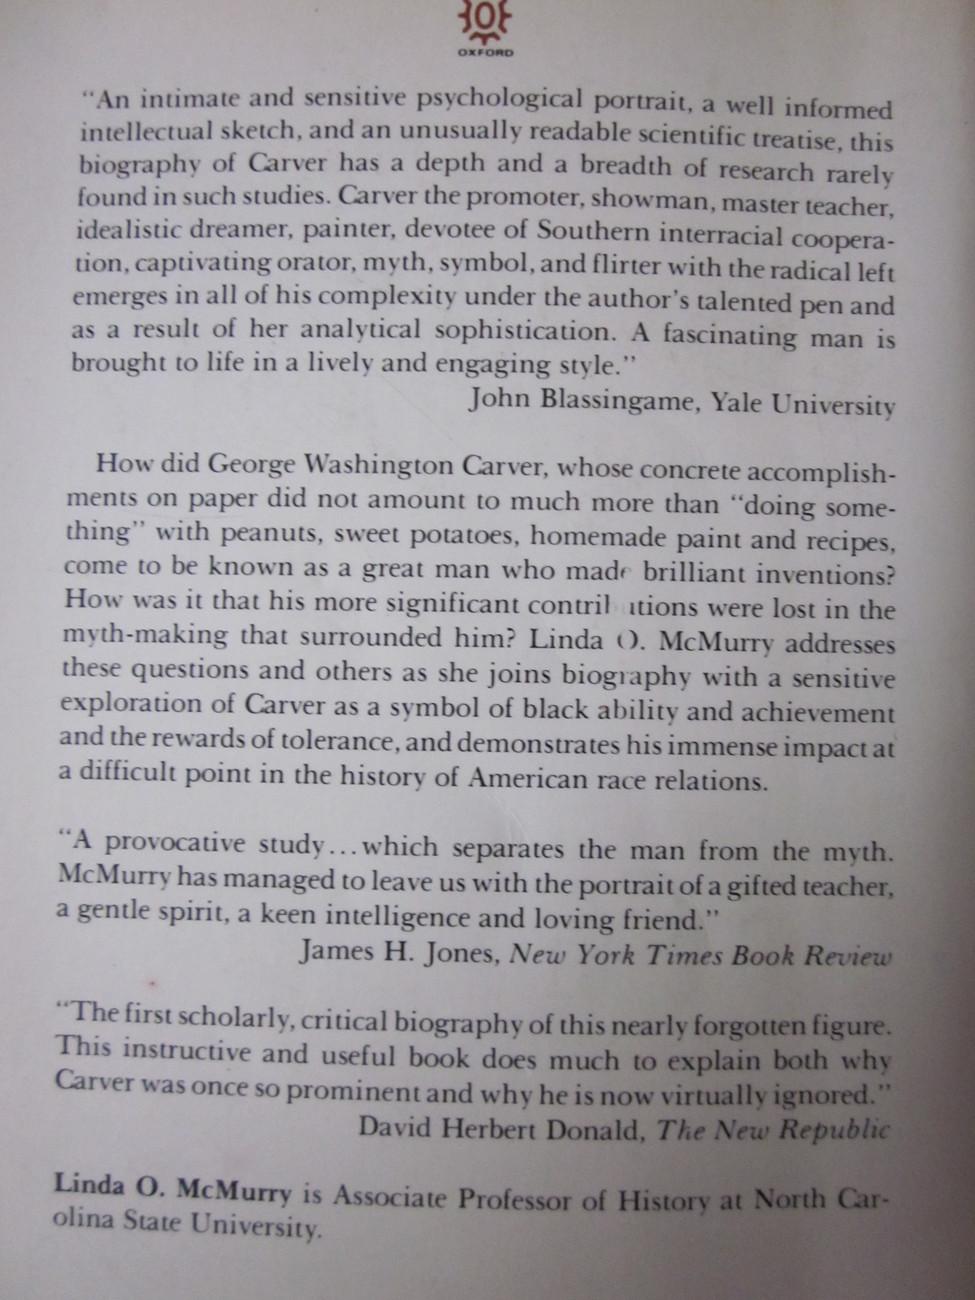 George Washington Carver Scientist & Symbol Linda O. McMurry